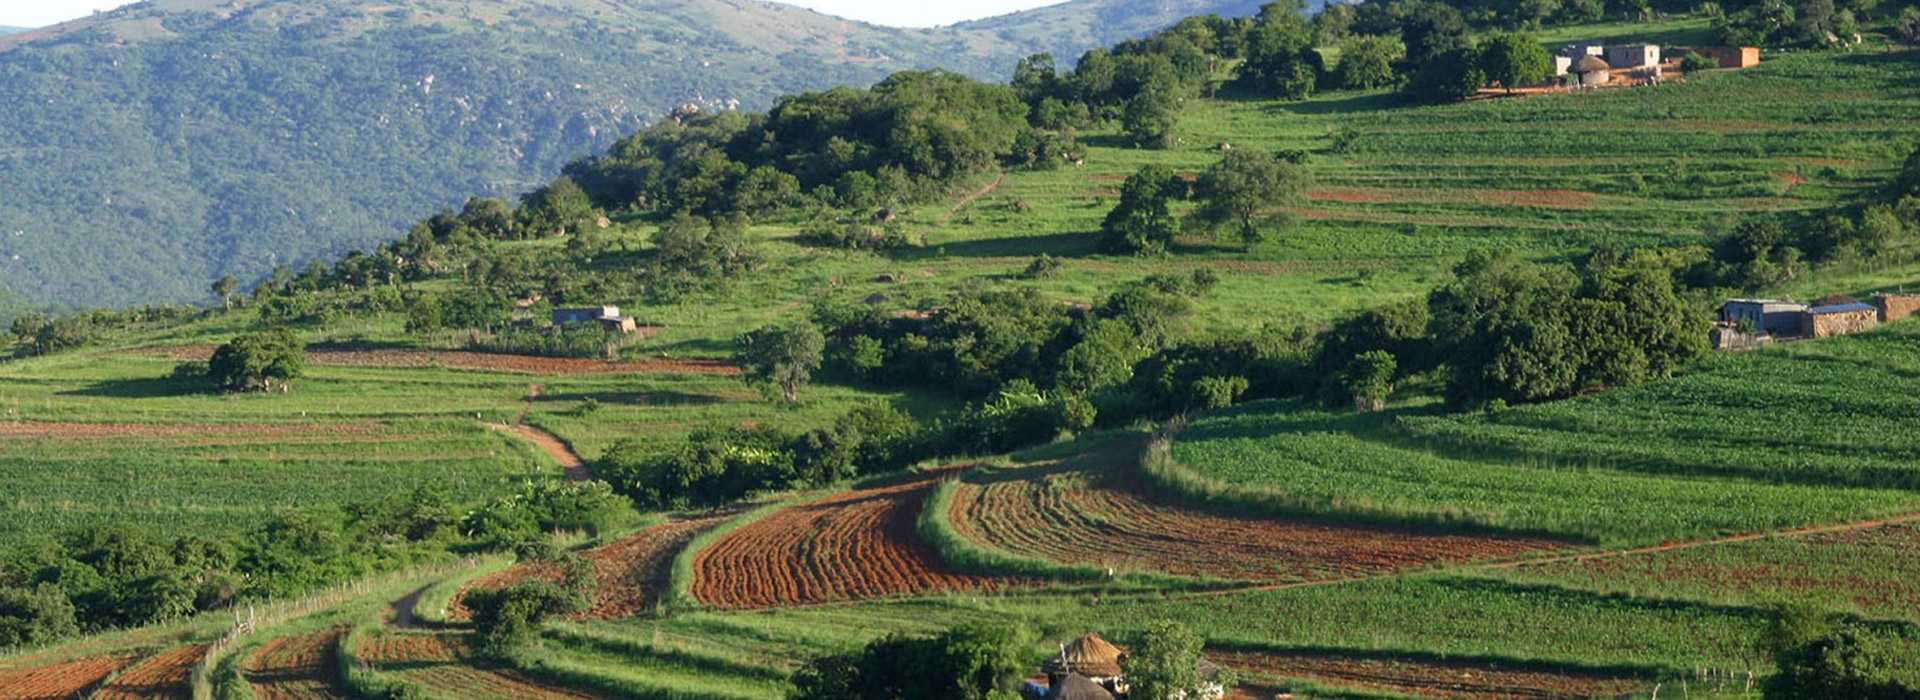 south africa swaziland somak holidays